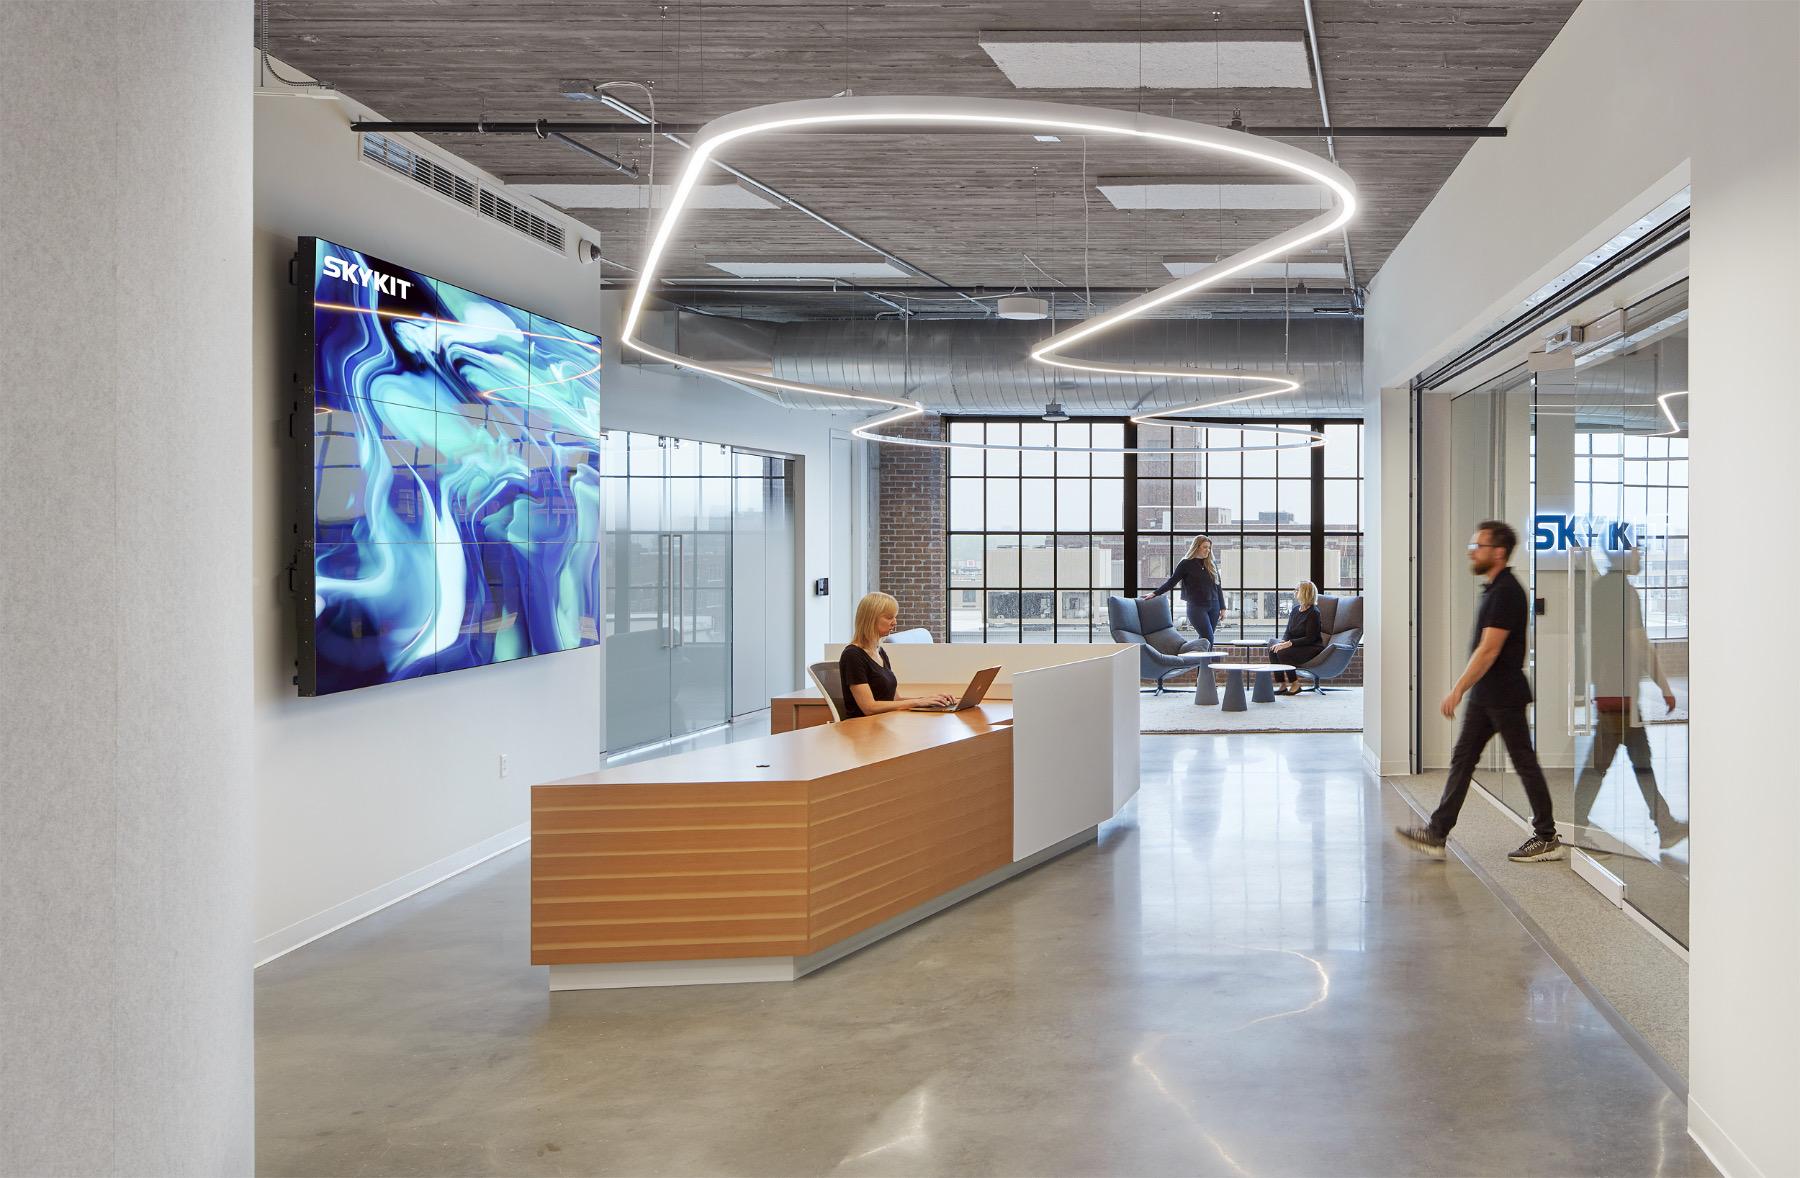 A Tour of Skykit's New Minneapolis Office